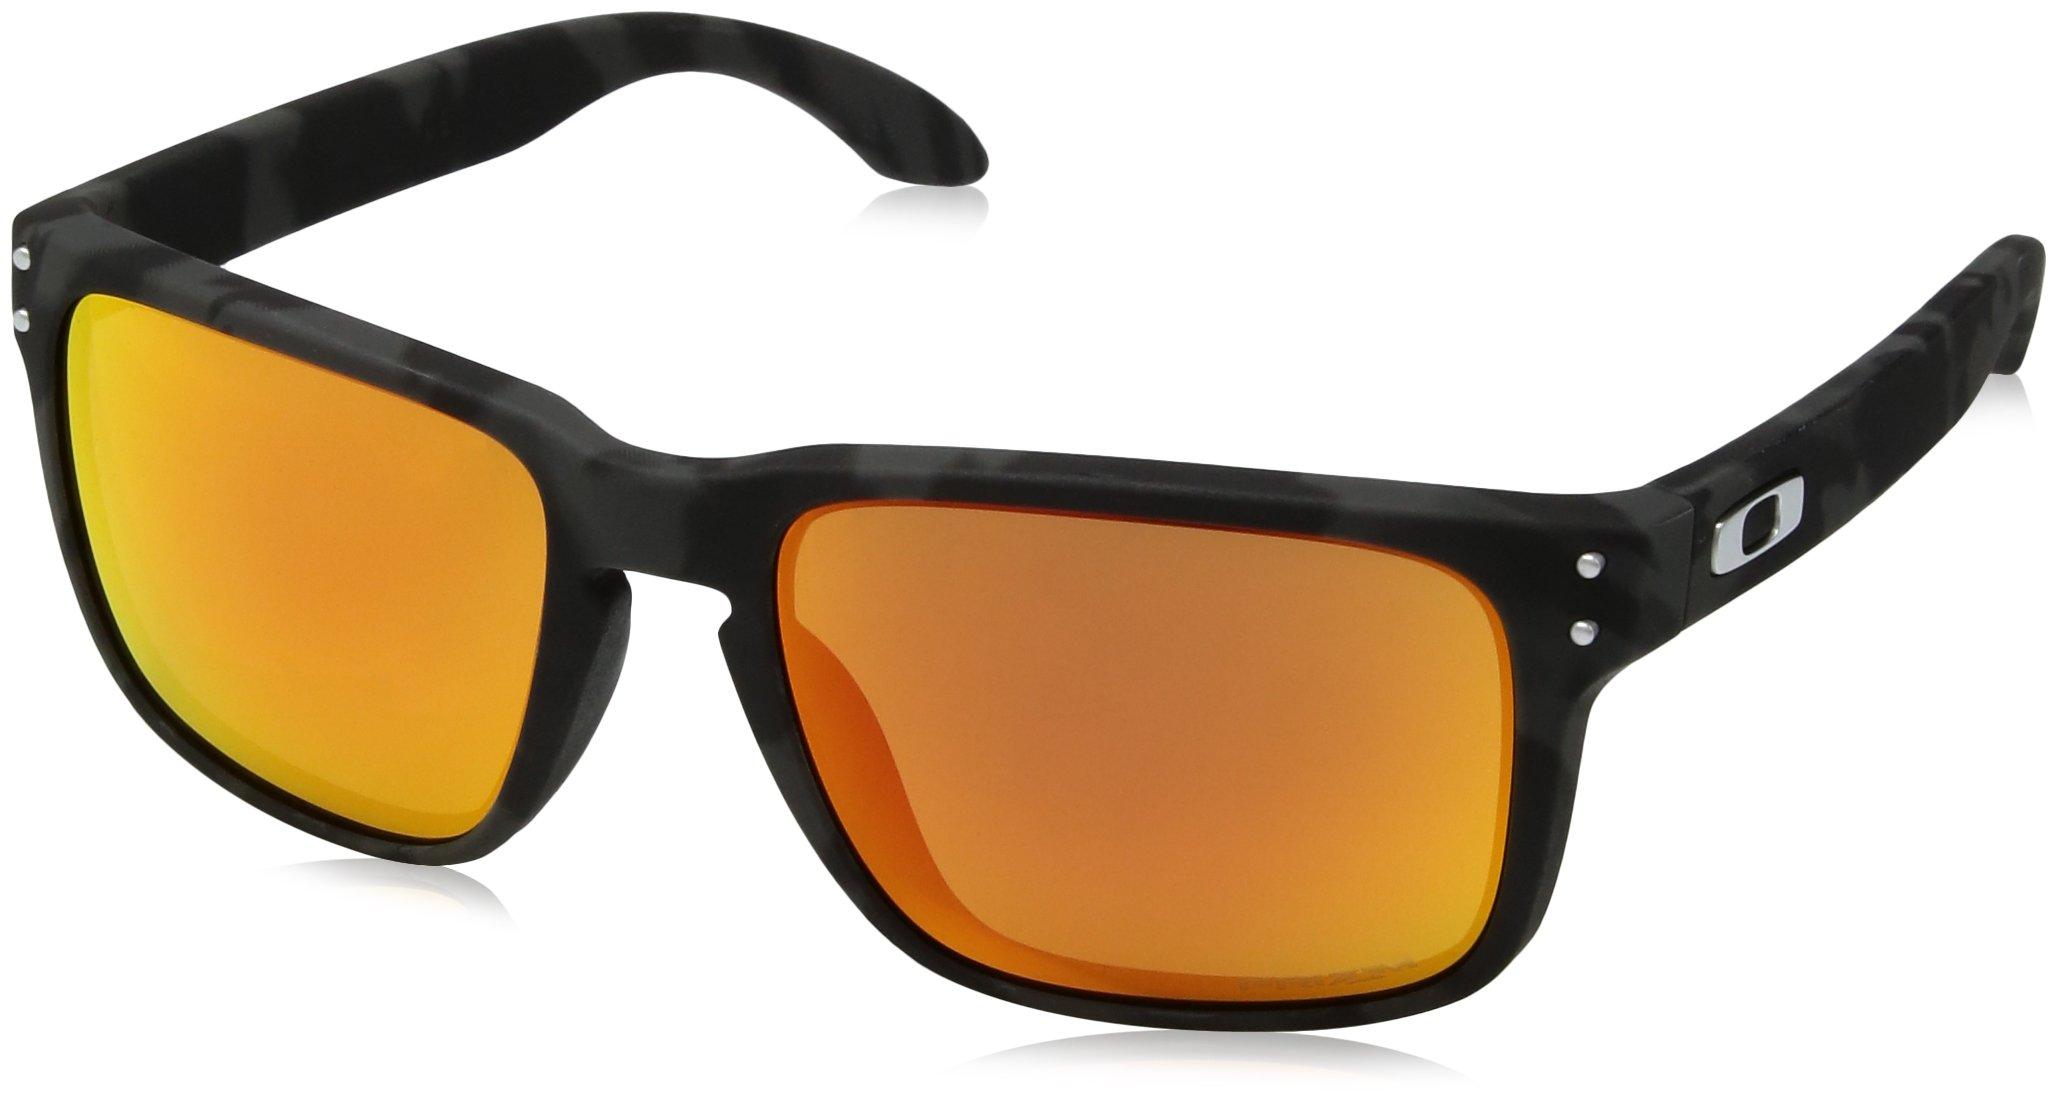 Oakley Men's Holbrook Sunglasses,Black Camo